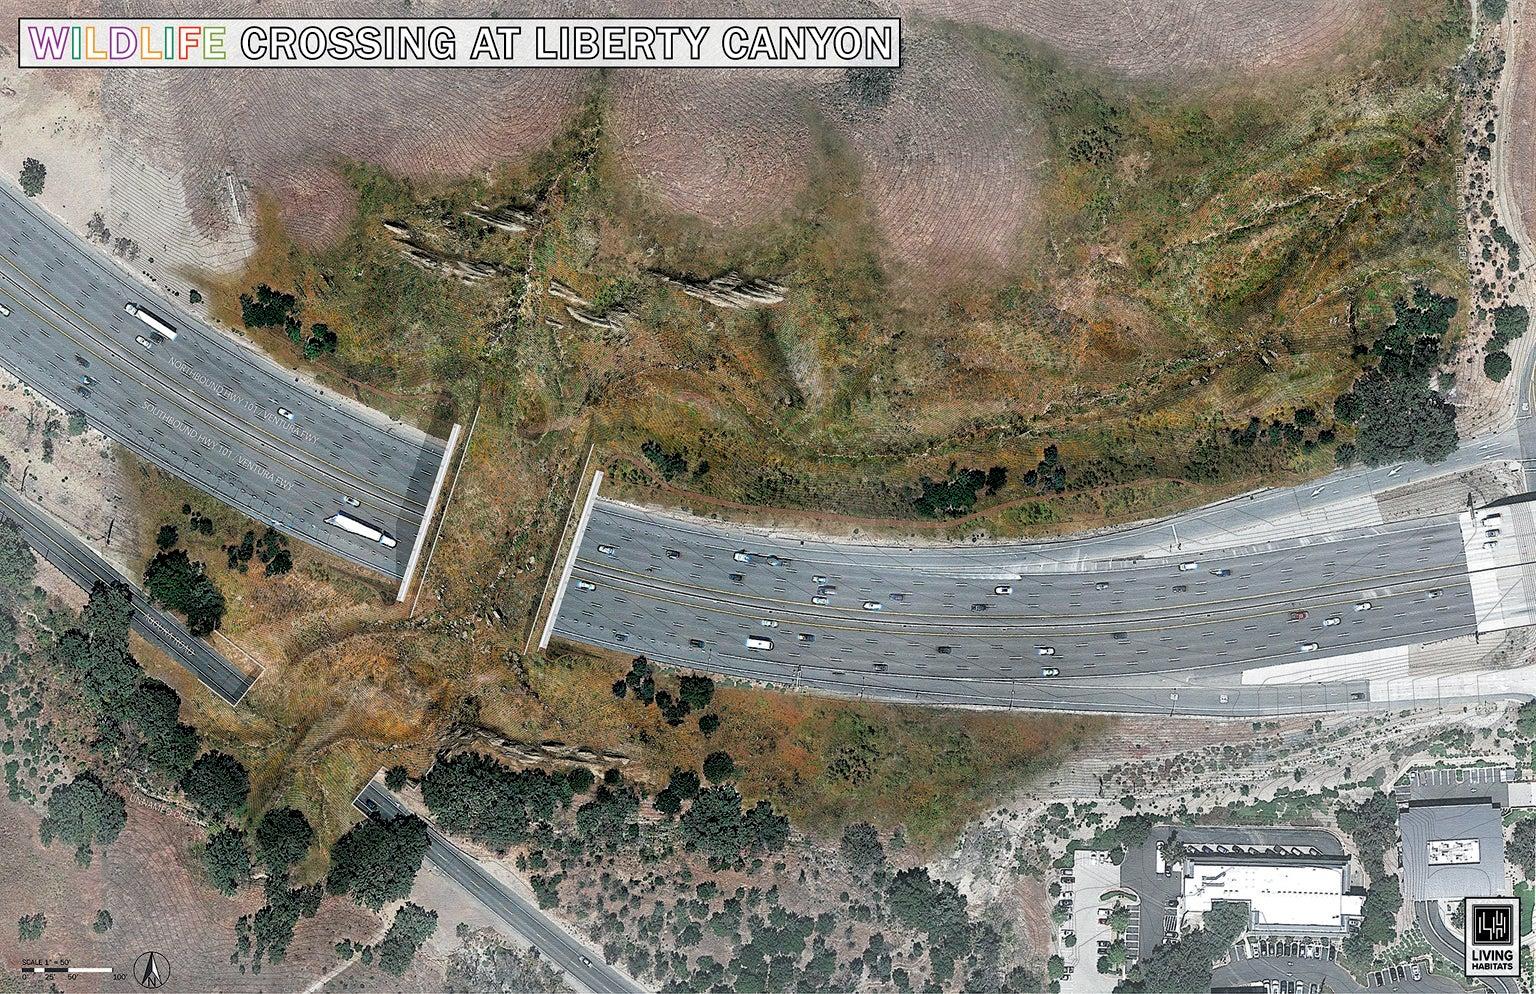 A wildlife bridge to be built across Highway 101, shown in an artist's rendition.